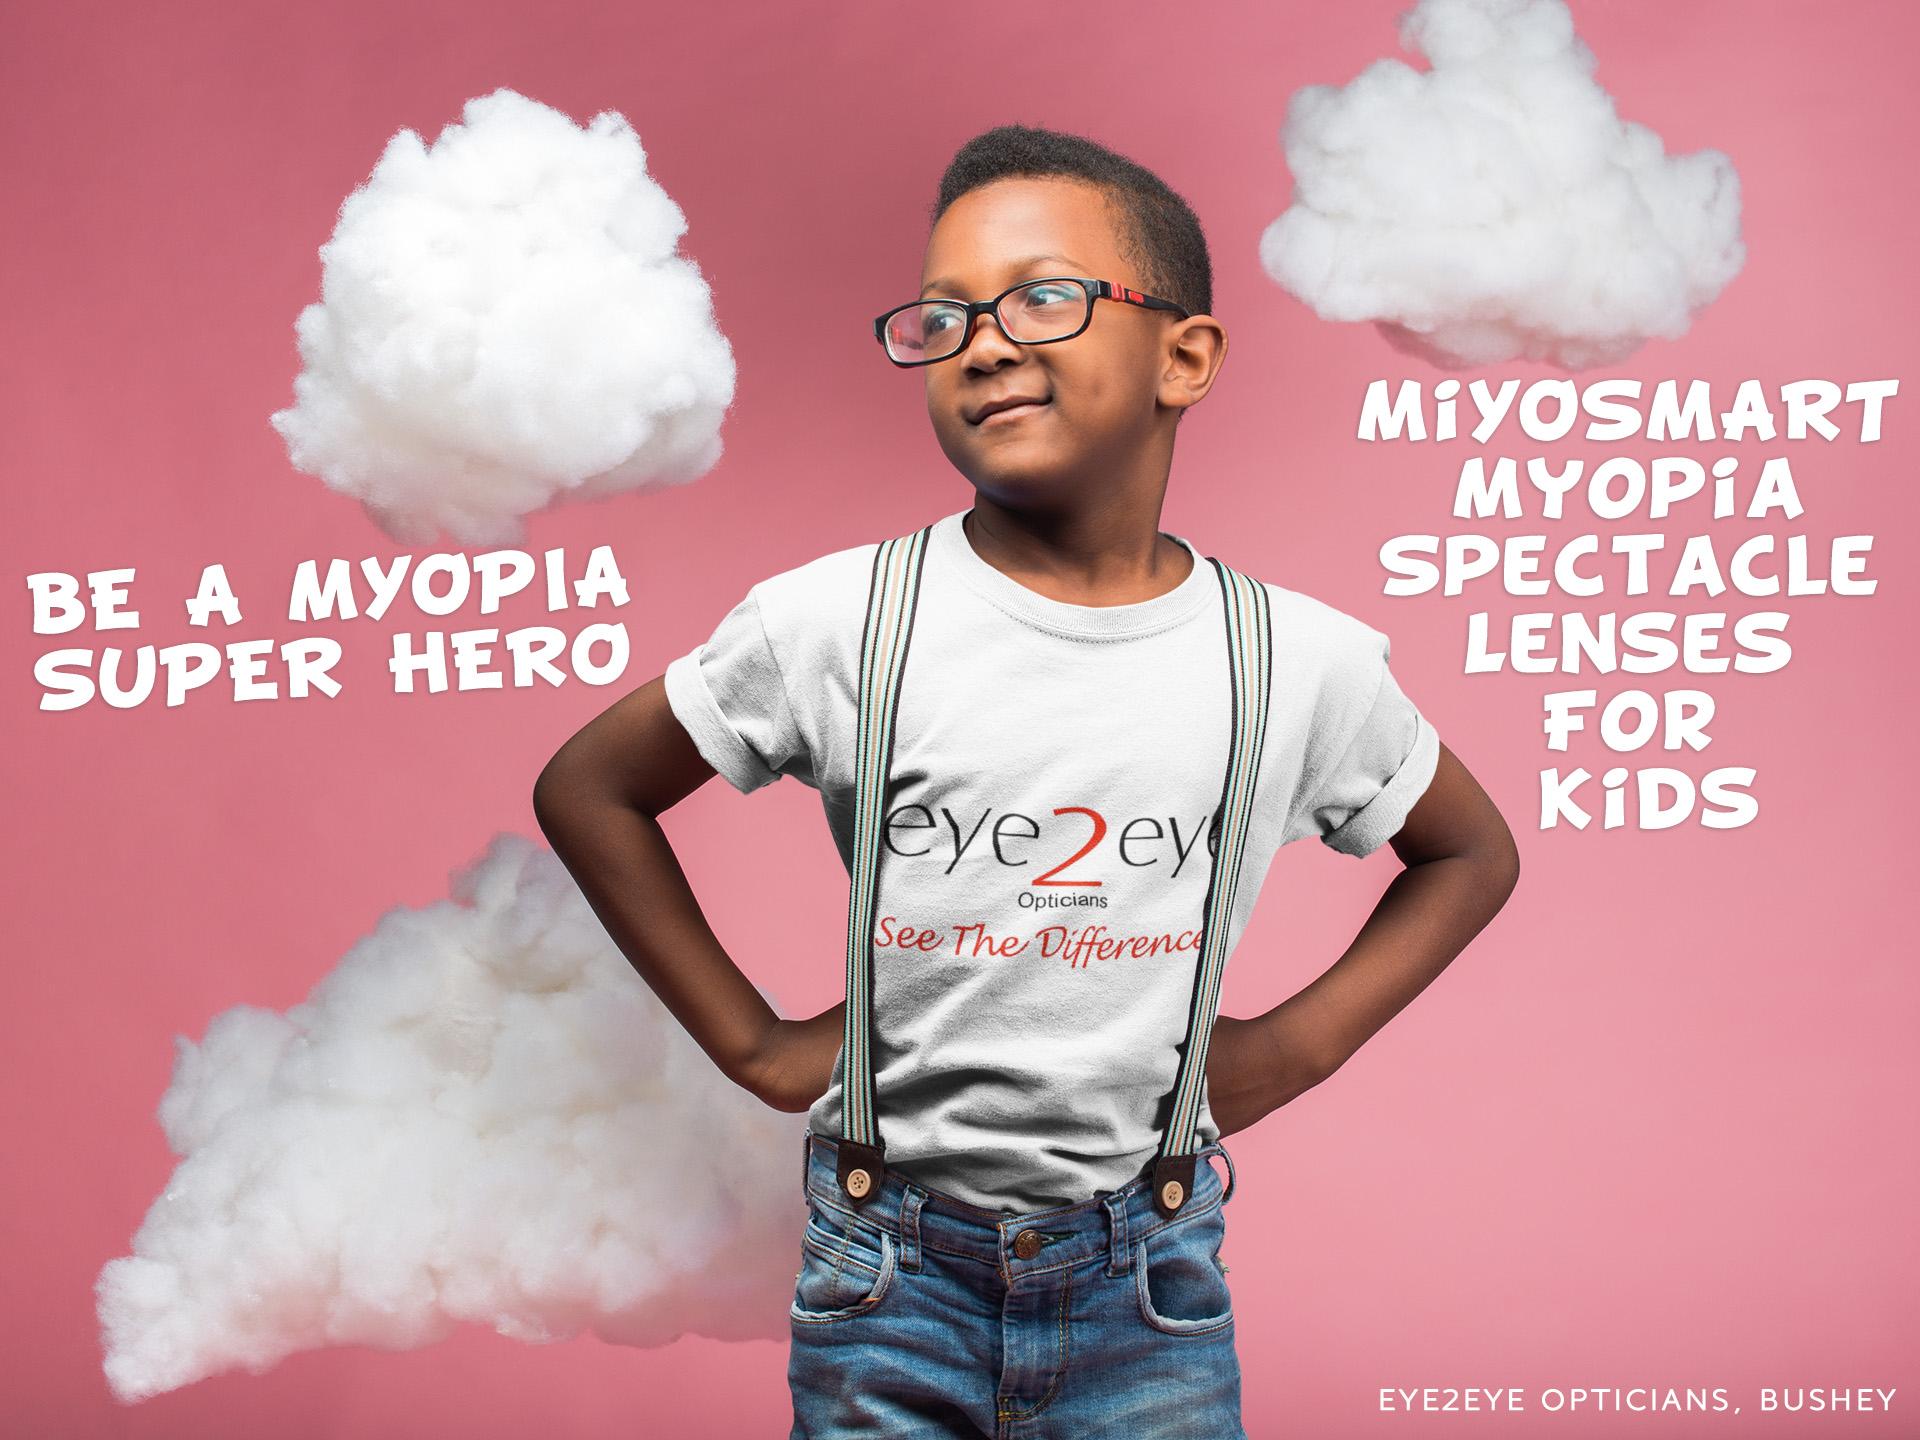 Myopia Control for kids